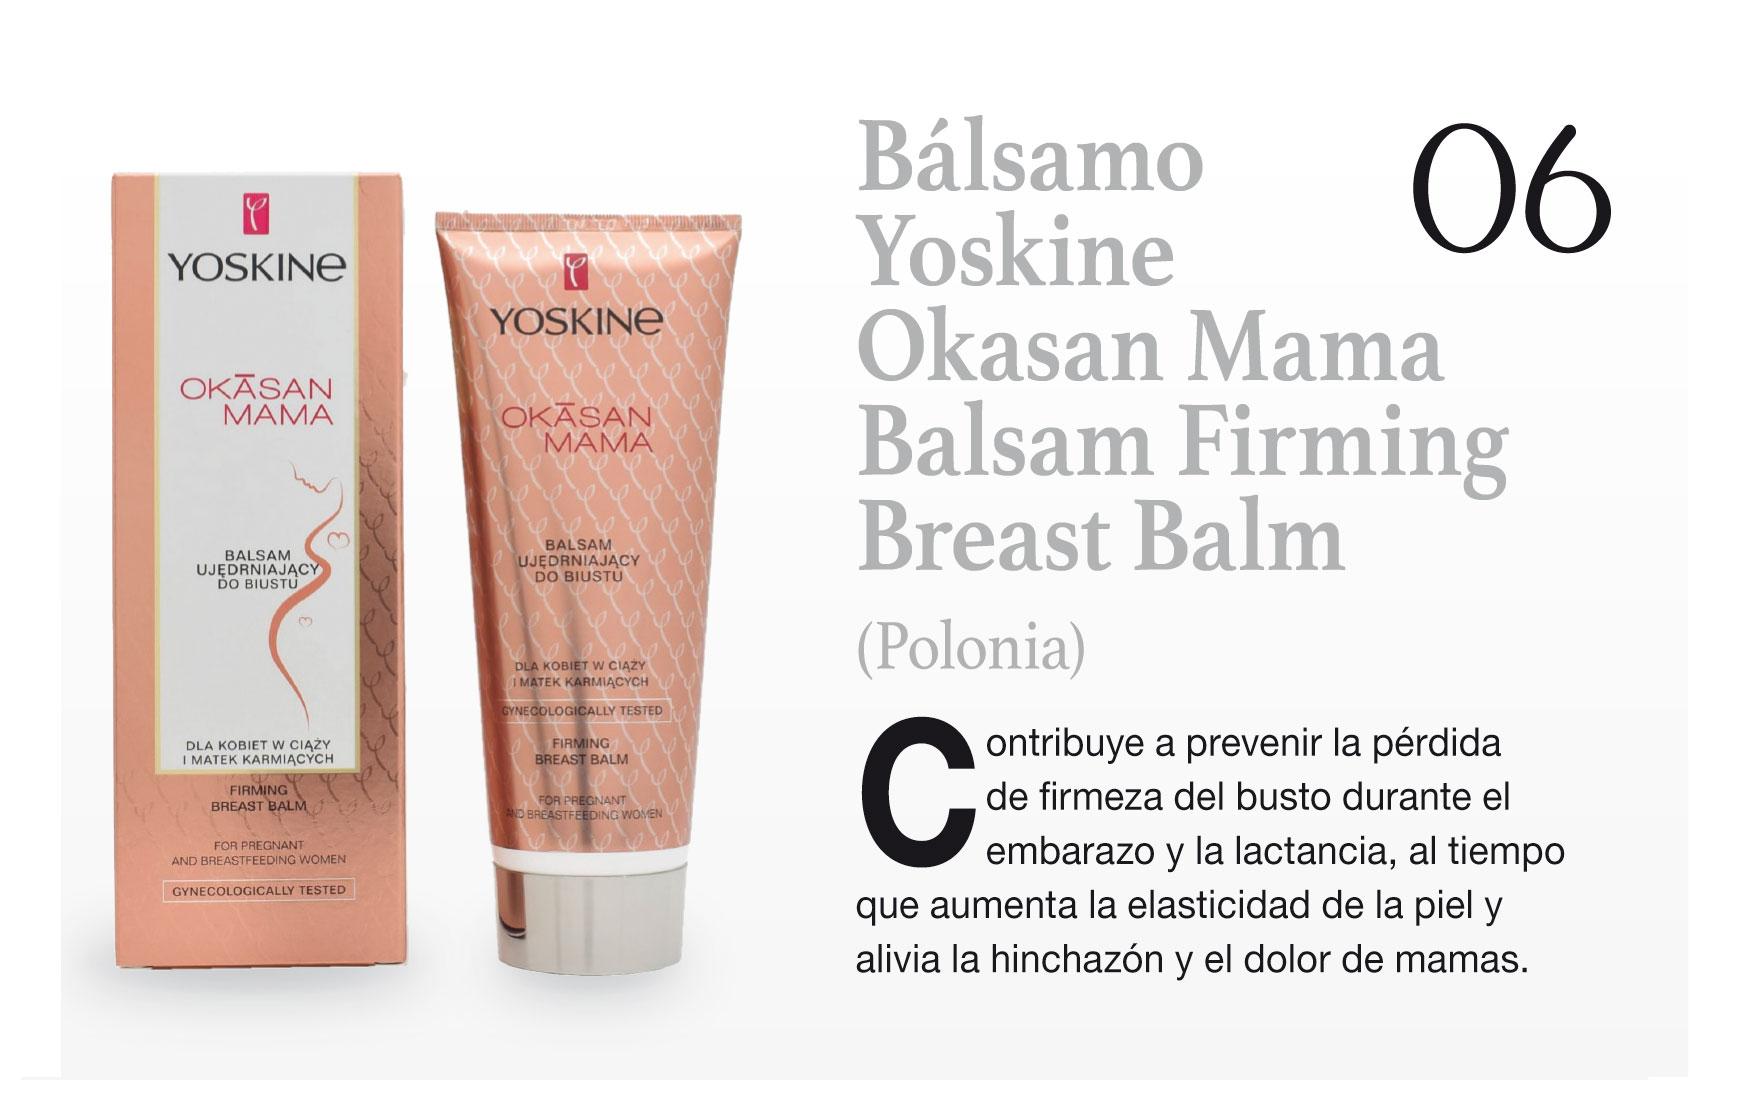 Bálsamo Yoskine Okasan Mama Balsam Firming Breast Balm (Polonia)